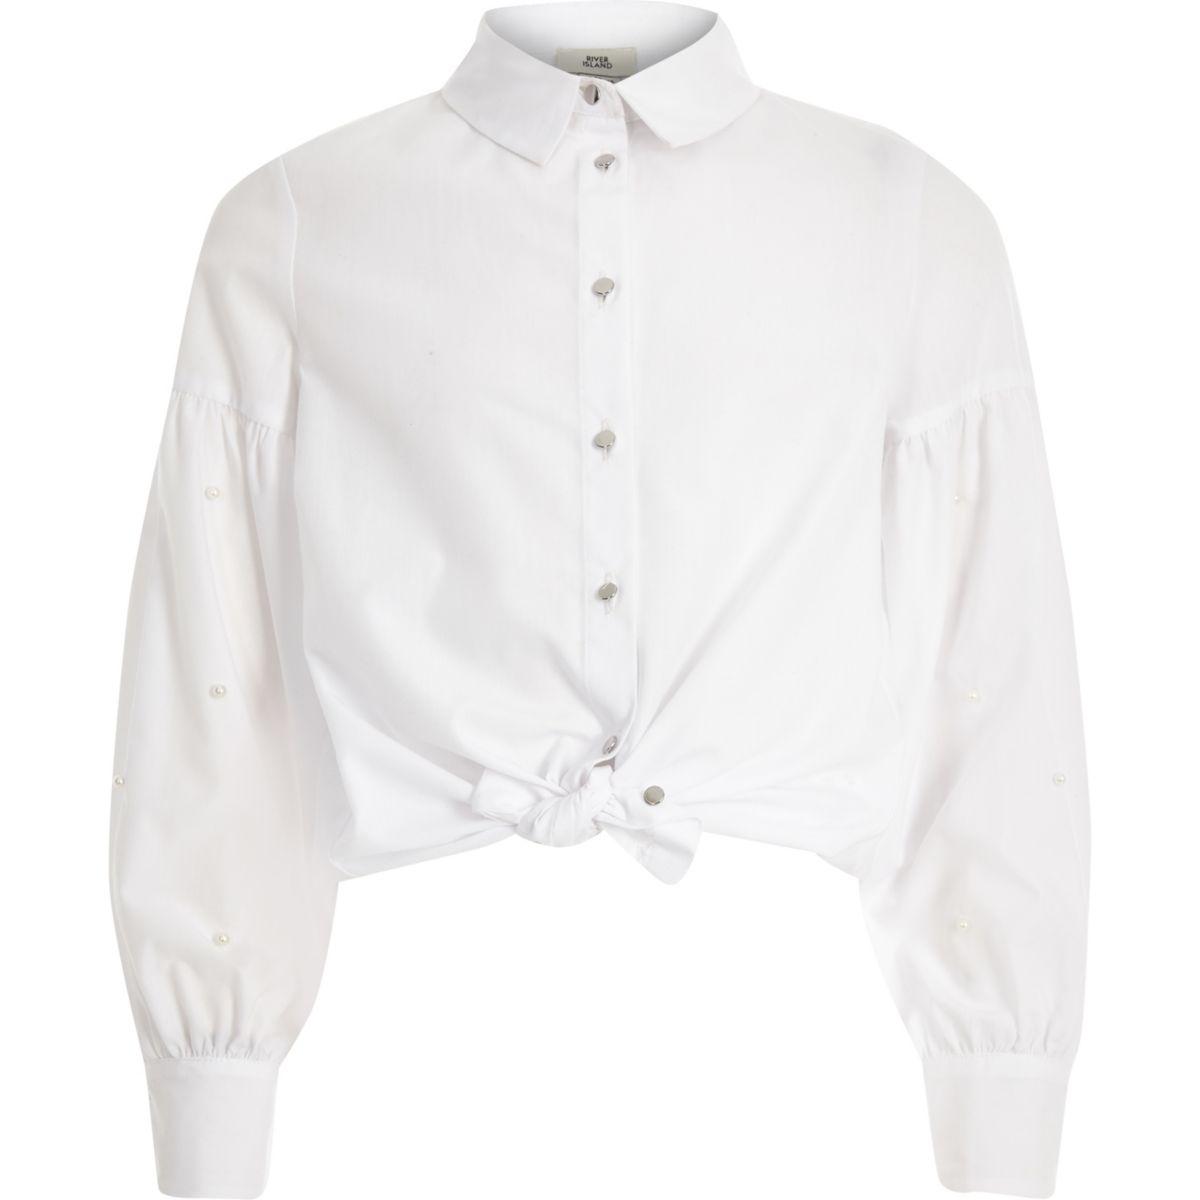 Girls white pearl embellished shirt